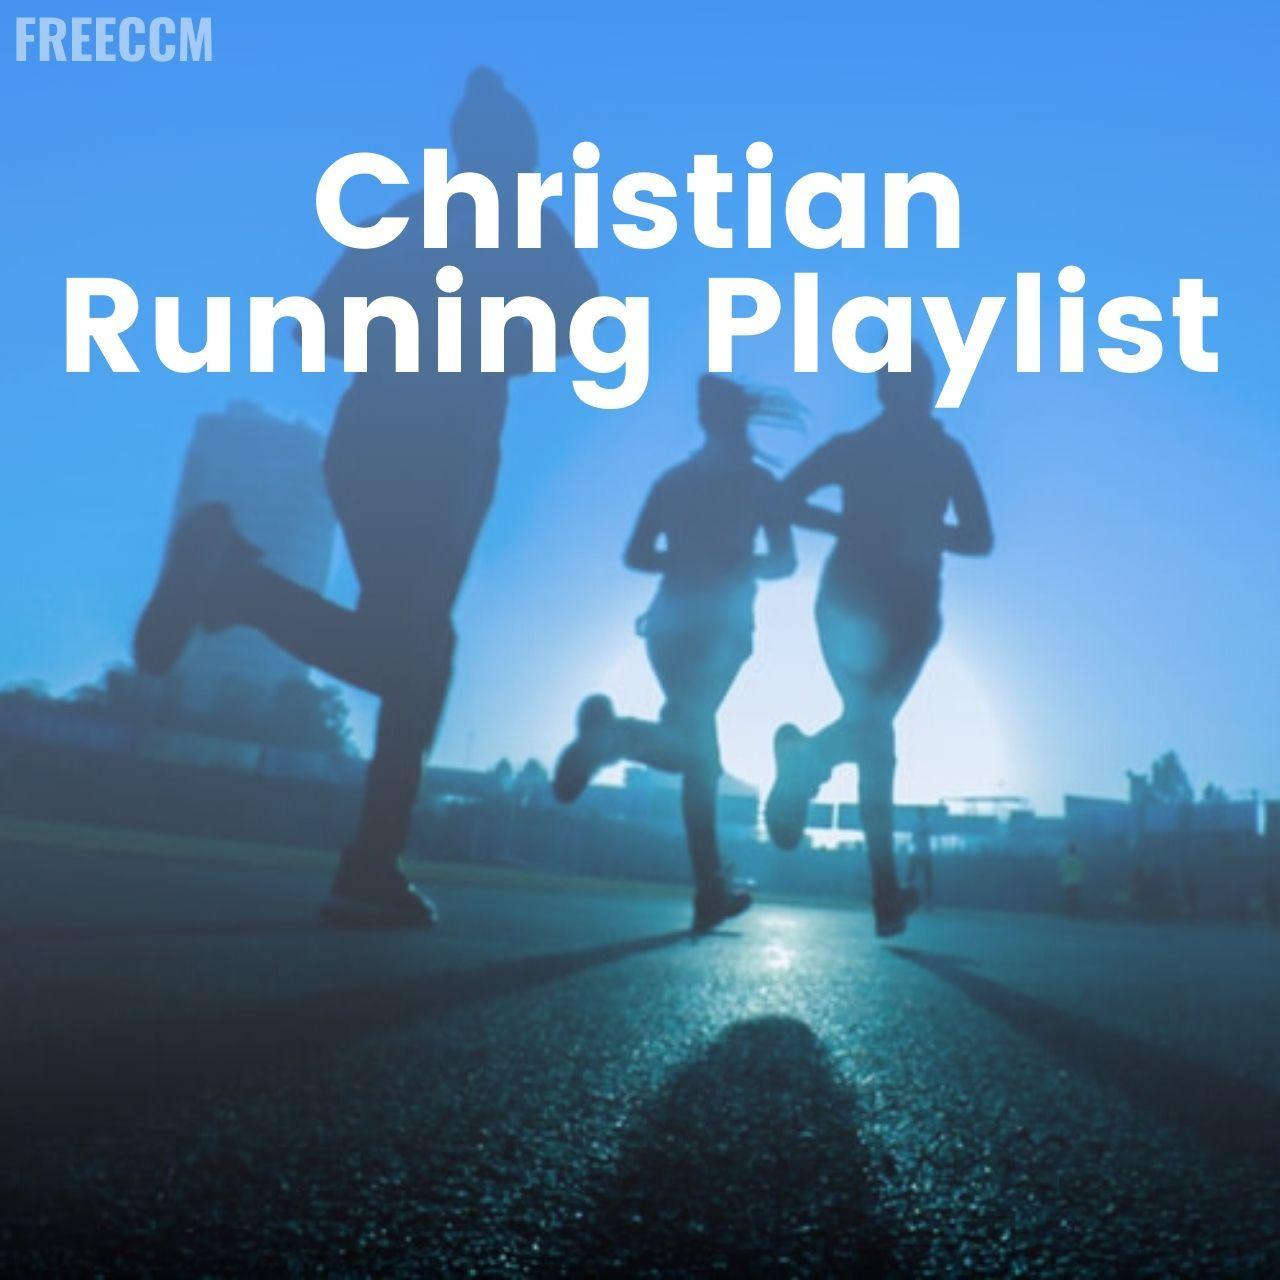 Christian Running Playlist Running Playlist Running Songs Playlists Christian Workout Songs